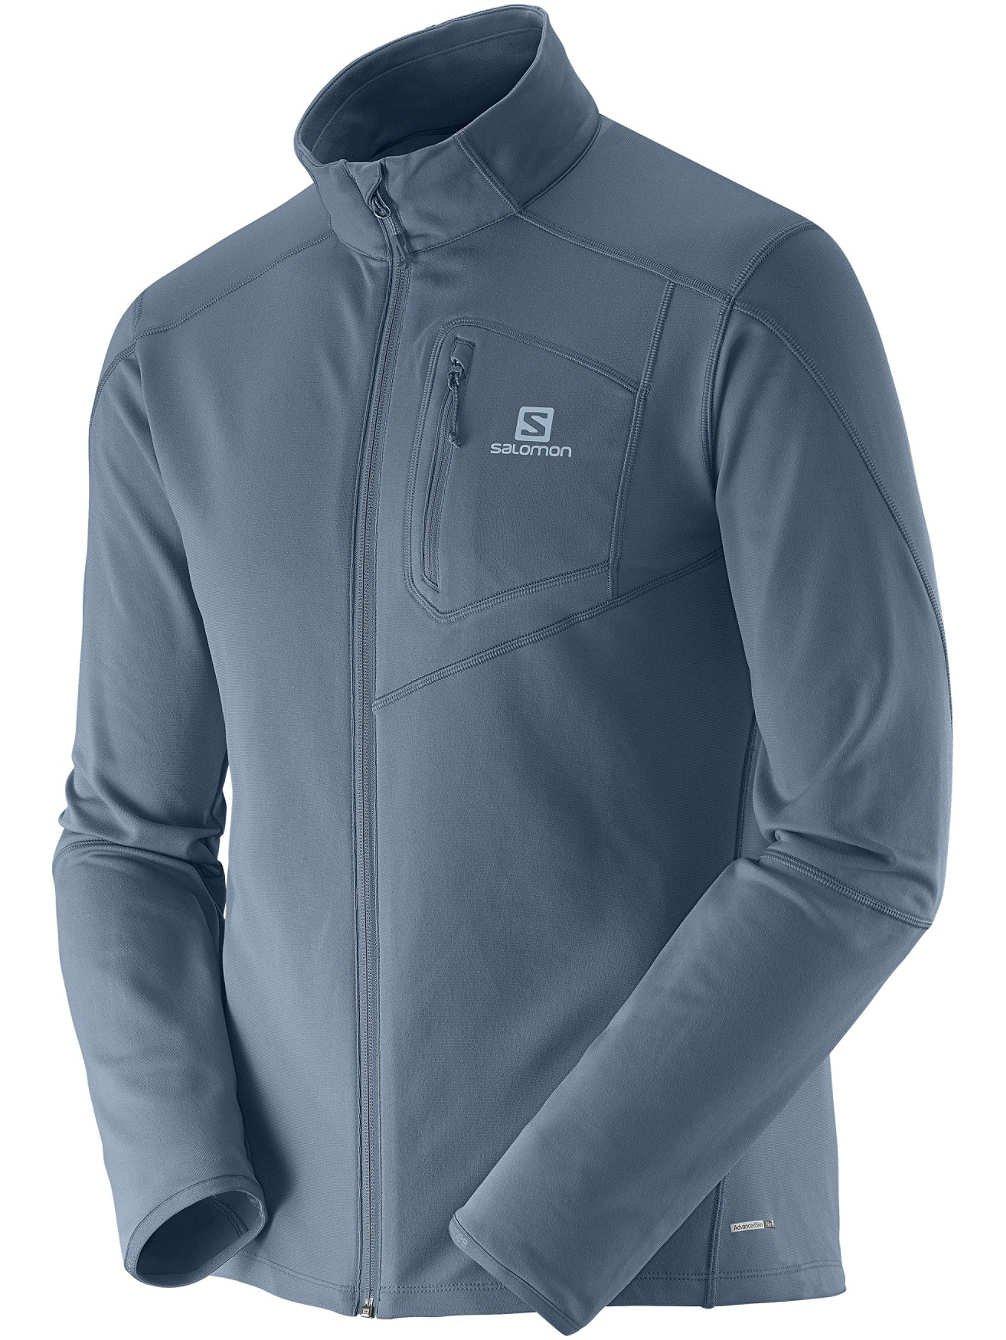 Salomon Mens Discovery Full Zip Midlayer Microfleece Jacket Light Blue